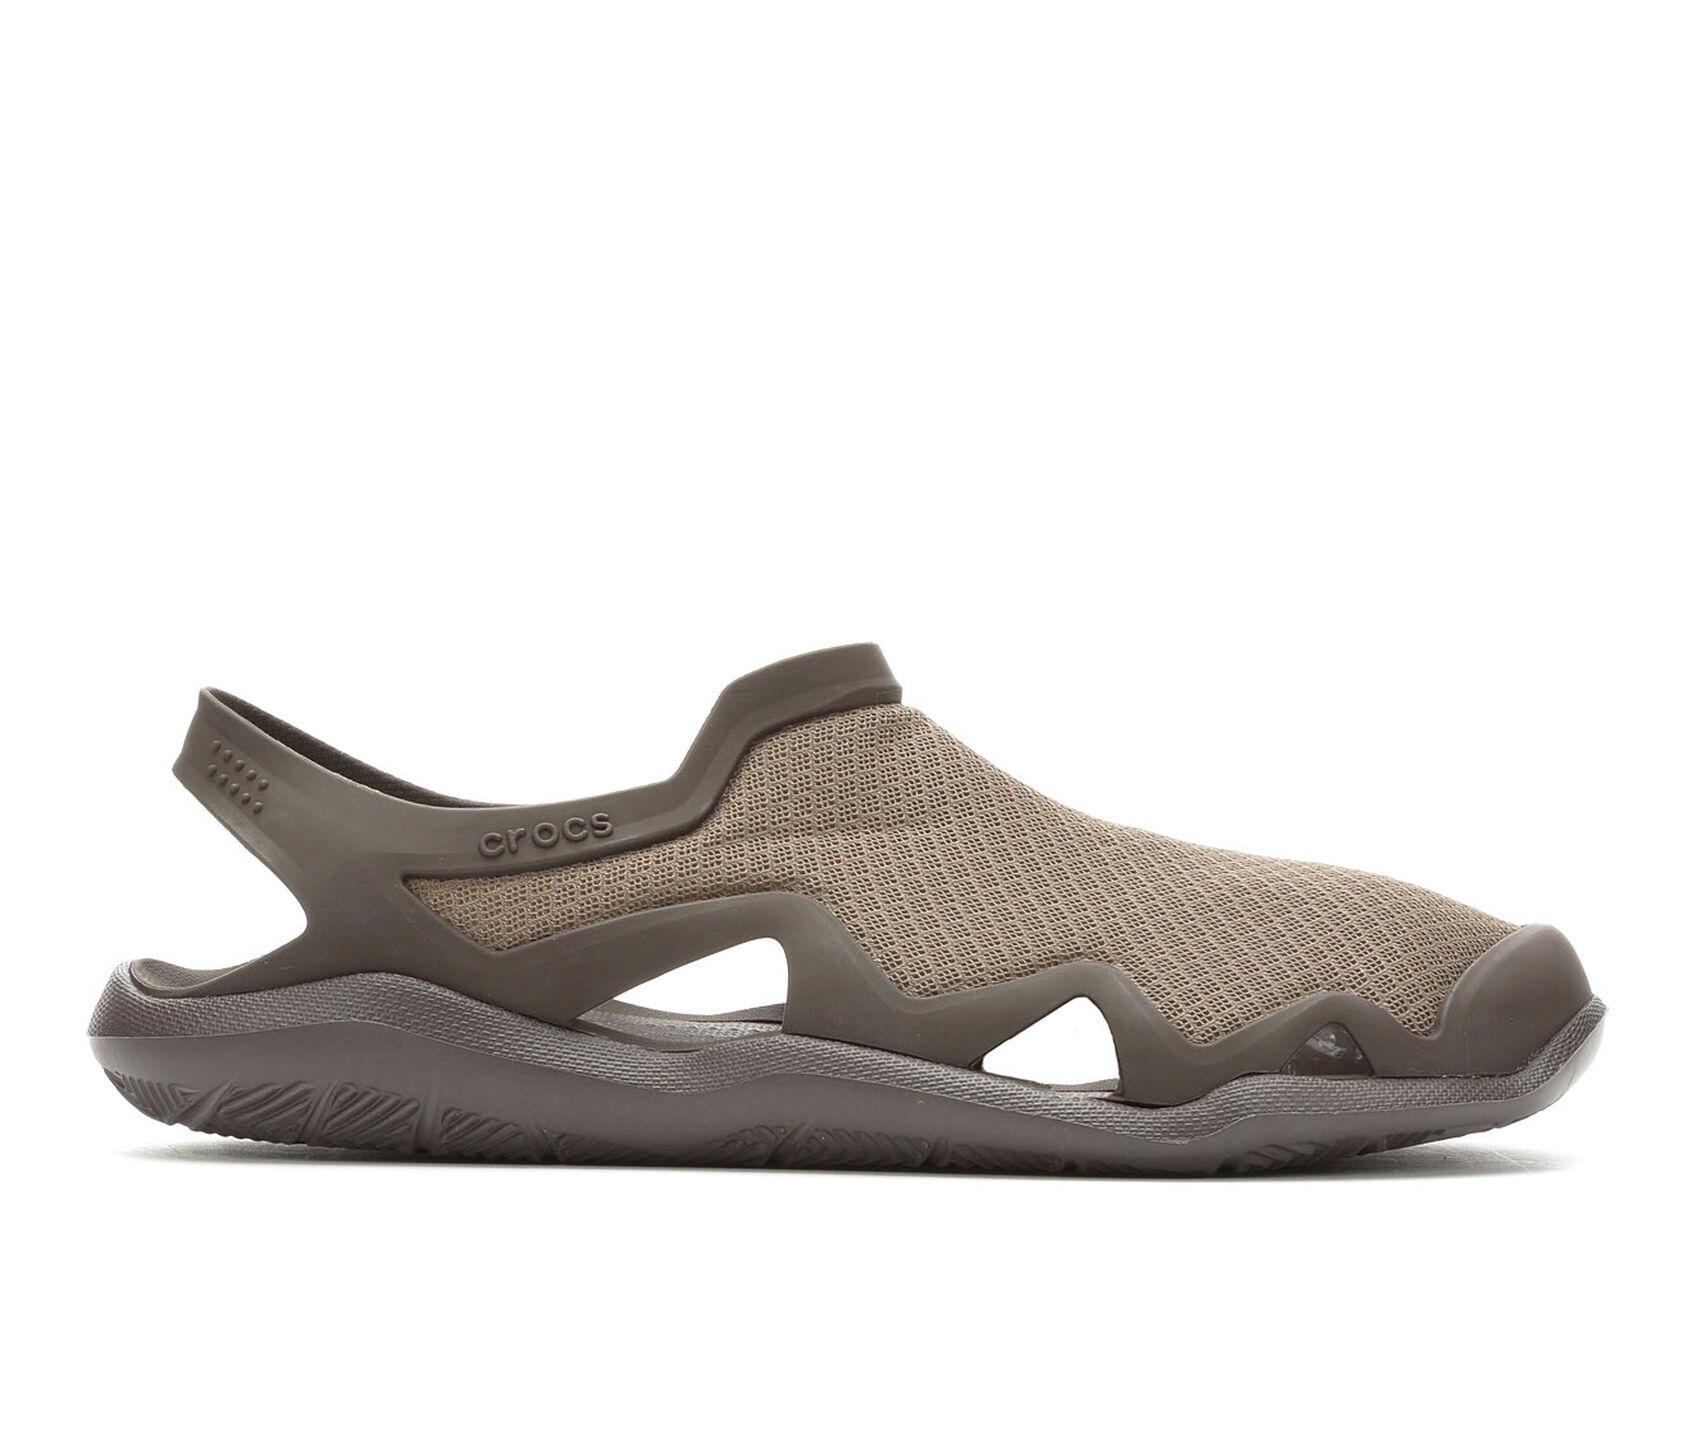 53fbbdd2d2a5 ... Crocs Swiftwater Mesh Wave Outdoor Sandals. Previous